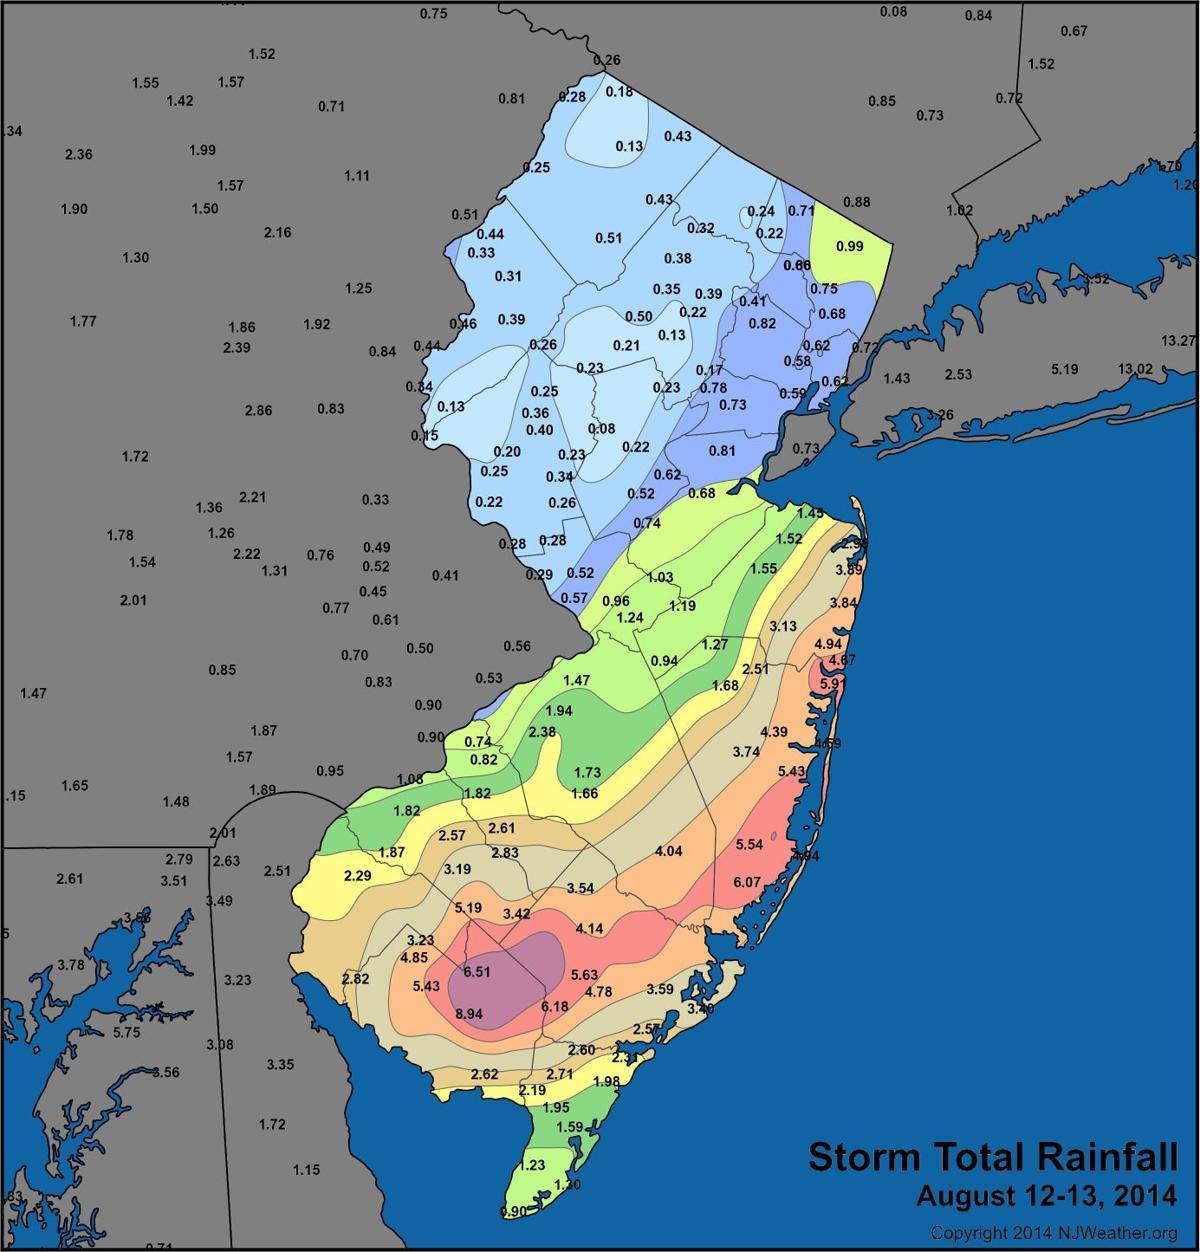 Map of rainfall amounts